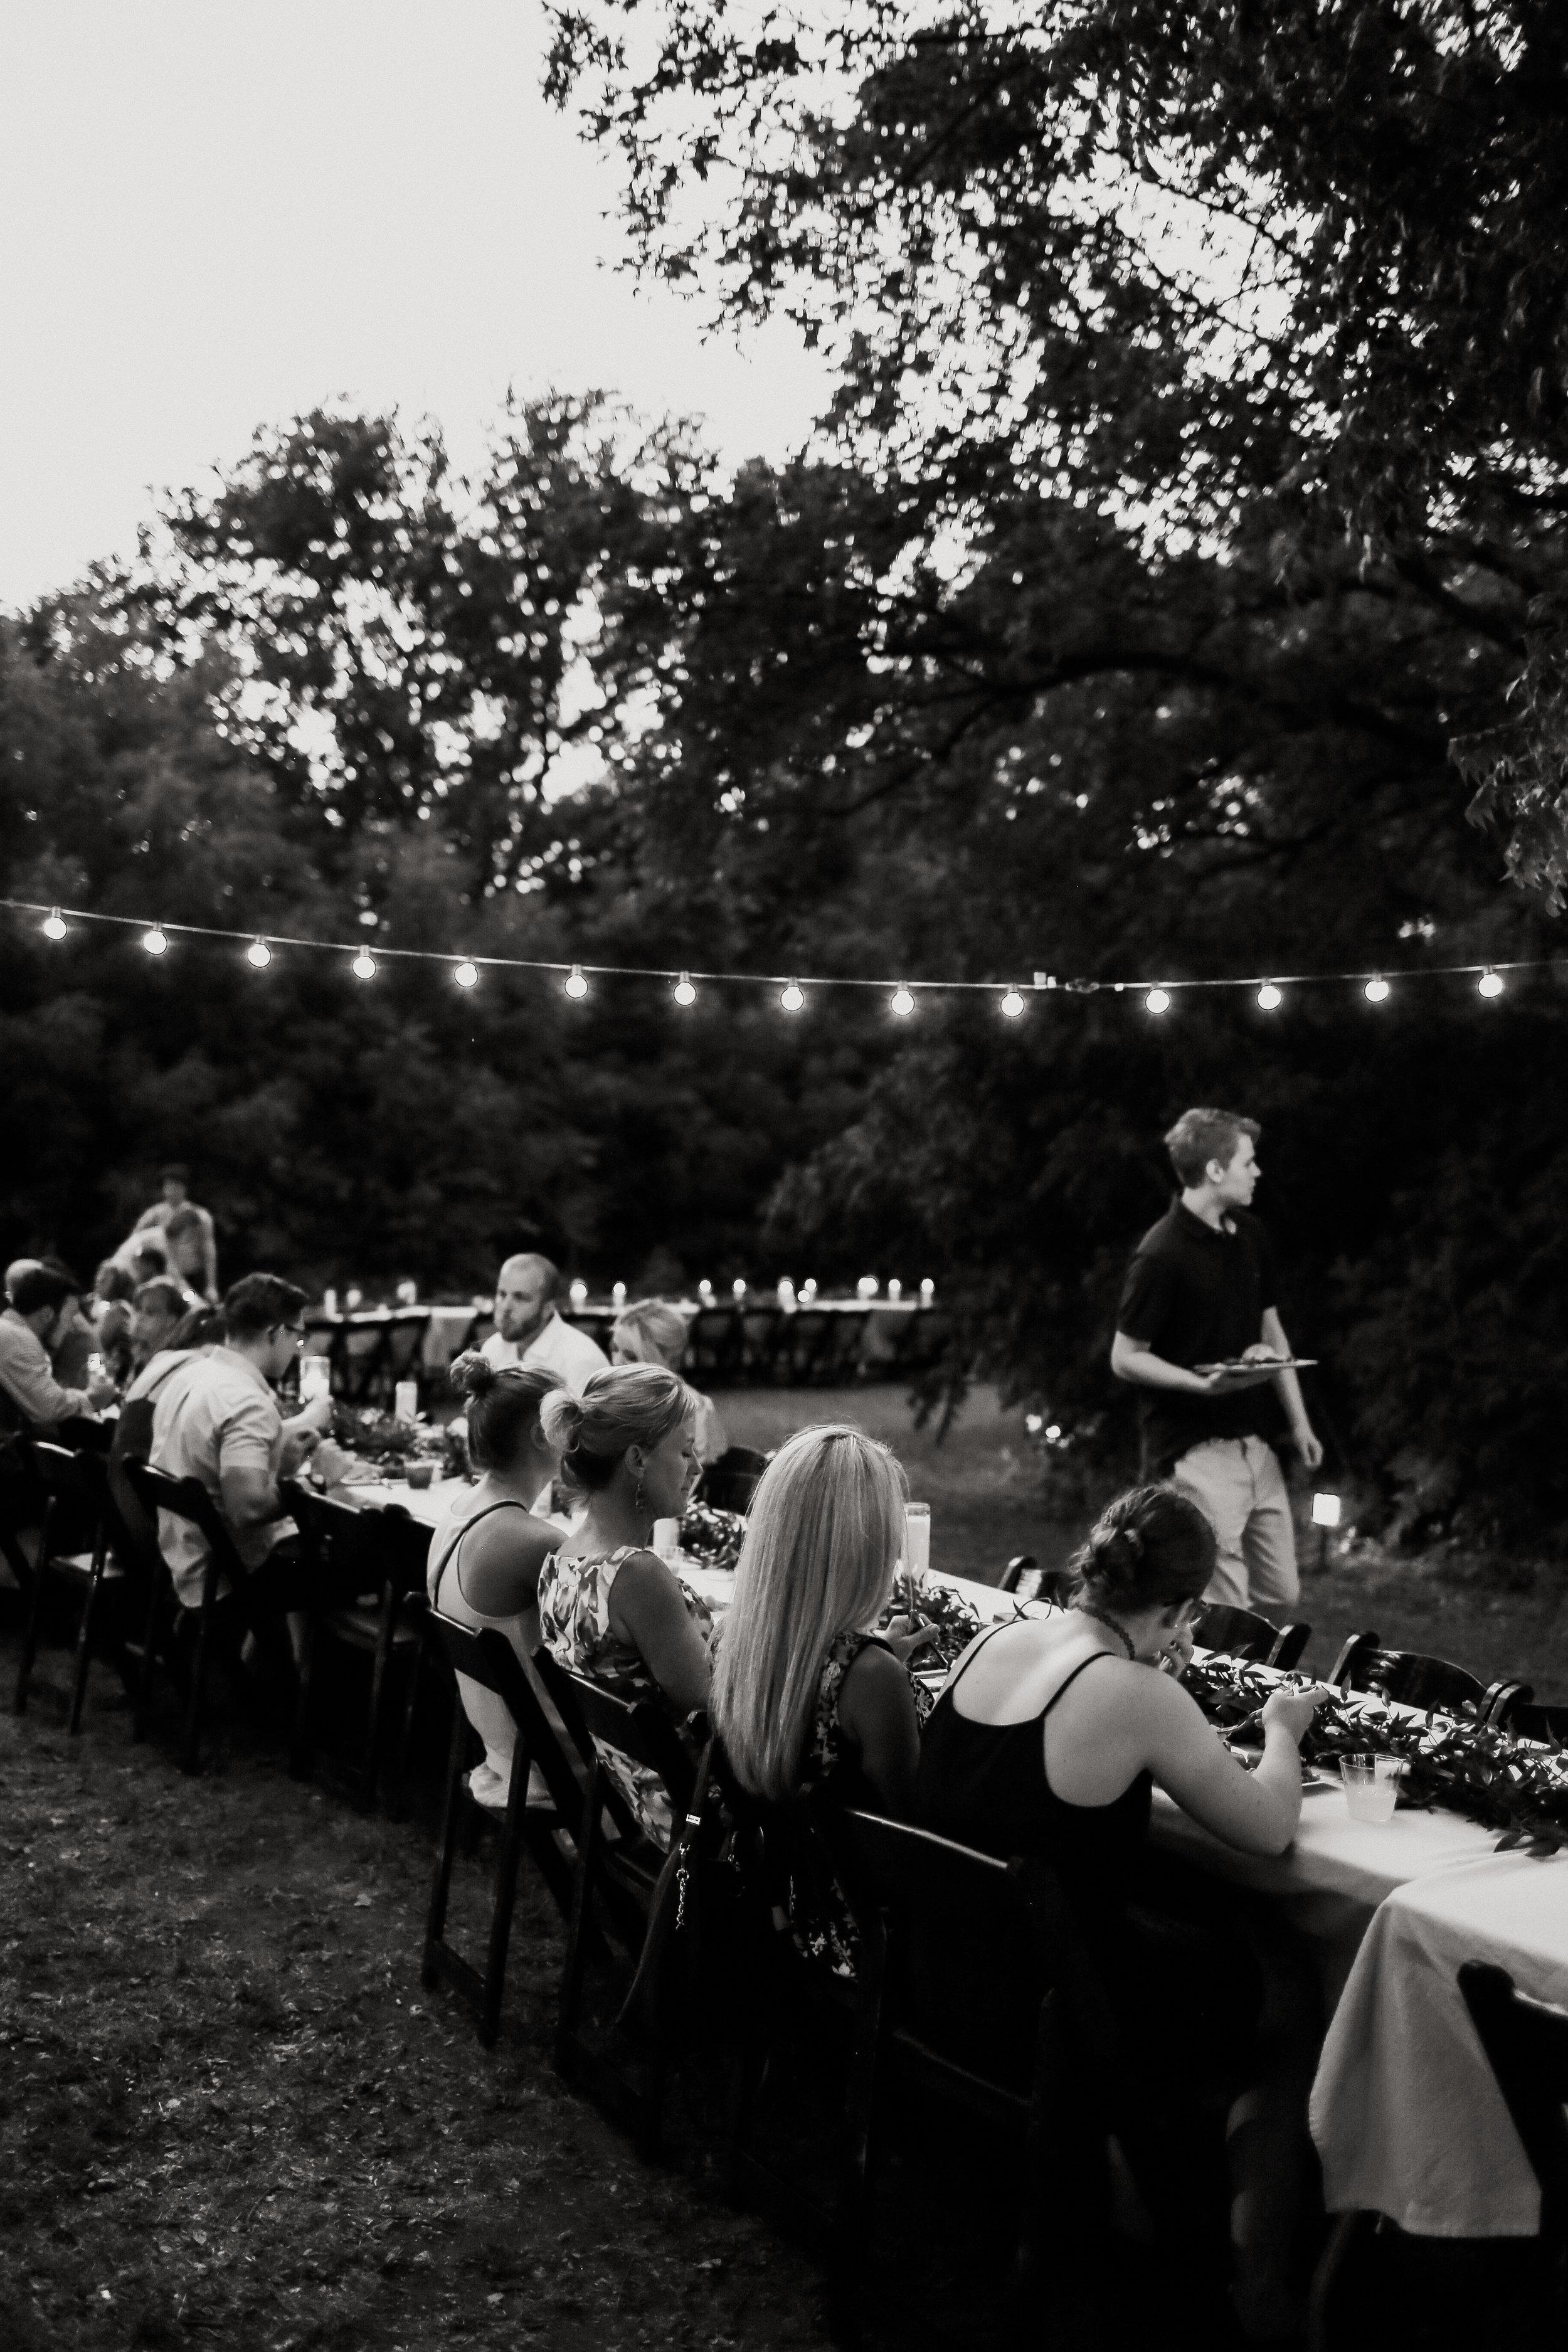 Backyard_Wedding_Oklahoma_MelissaMarshall_34.jpg